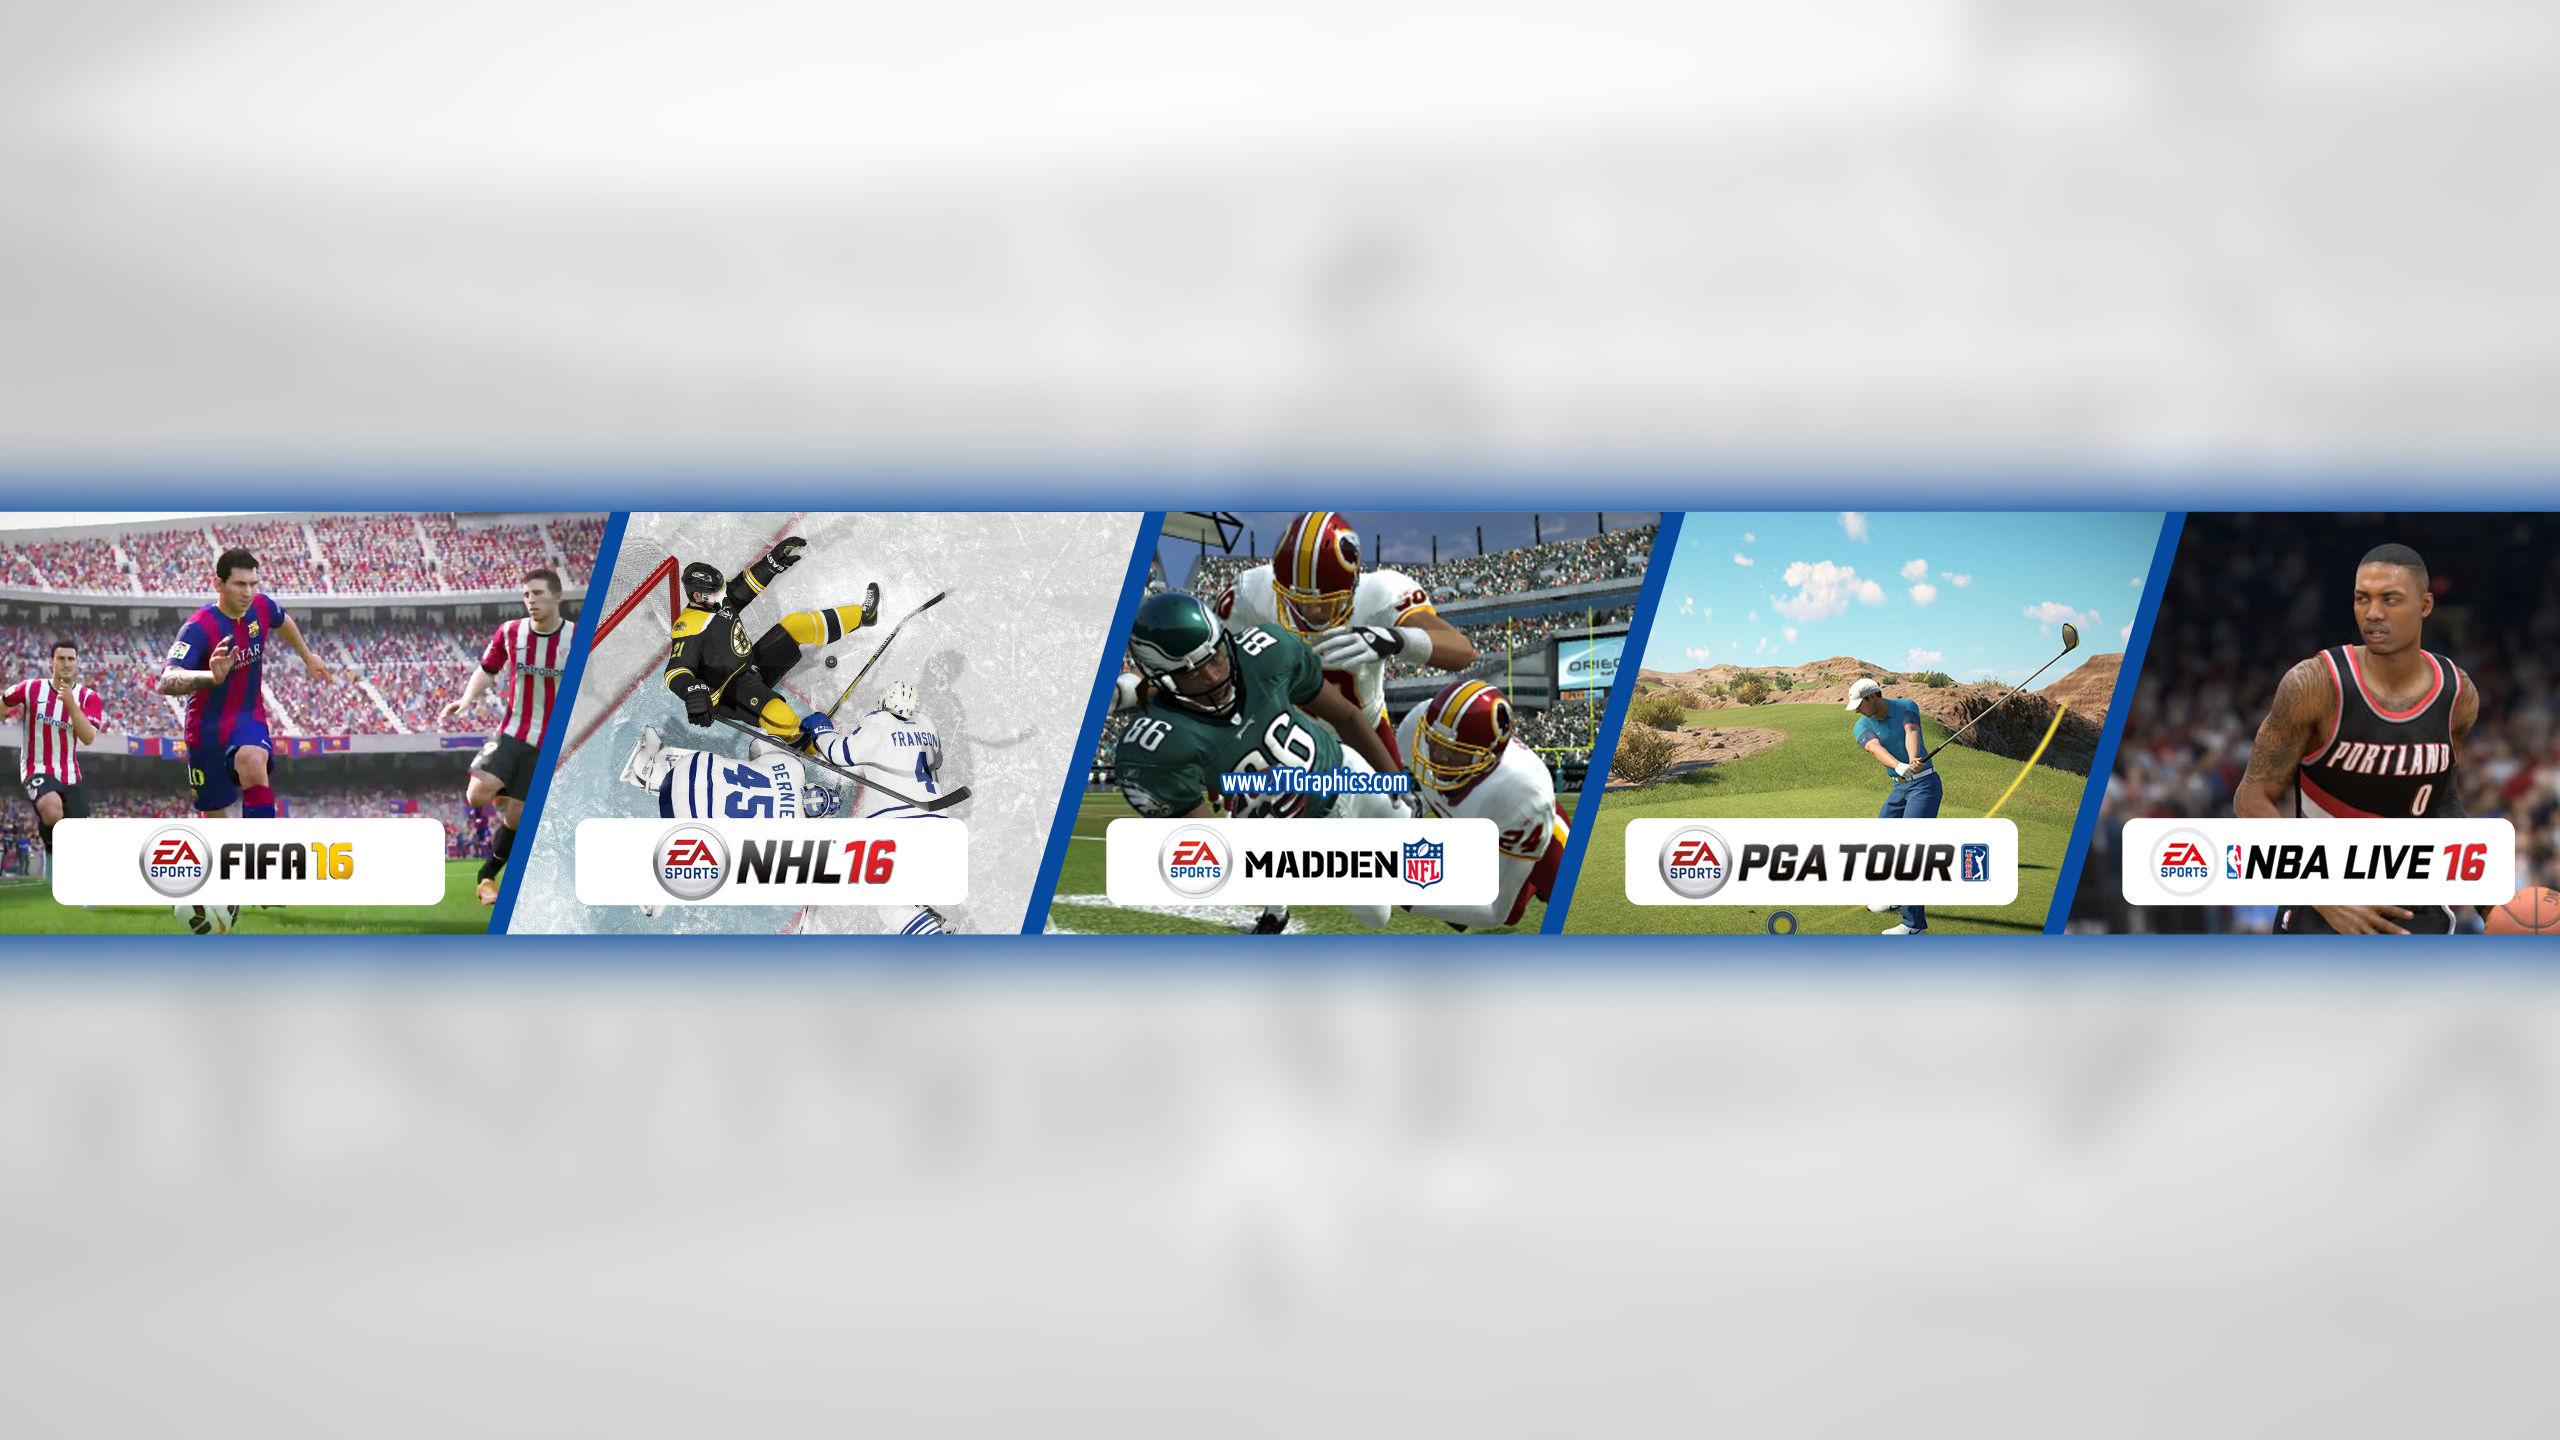 Mix: Sports Games: FIFA, NHL, Madden, PGA, NBA YouTube